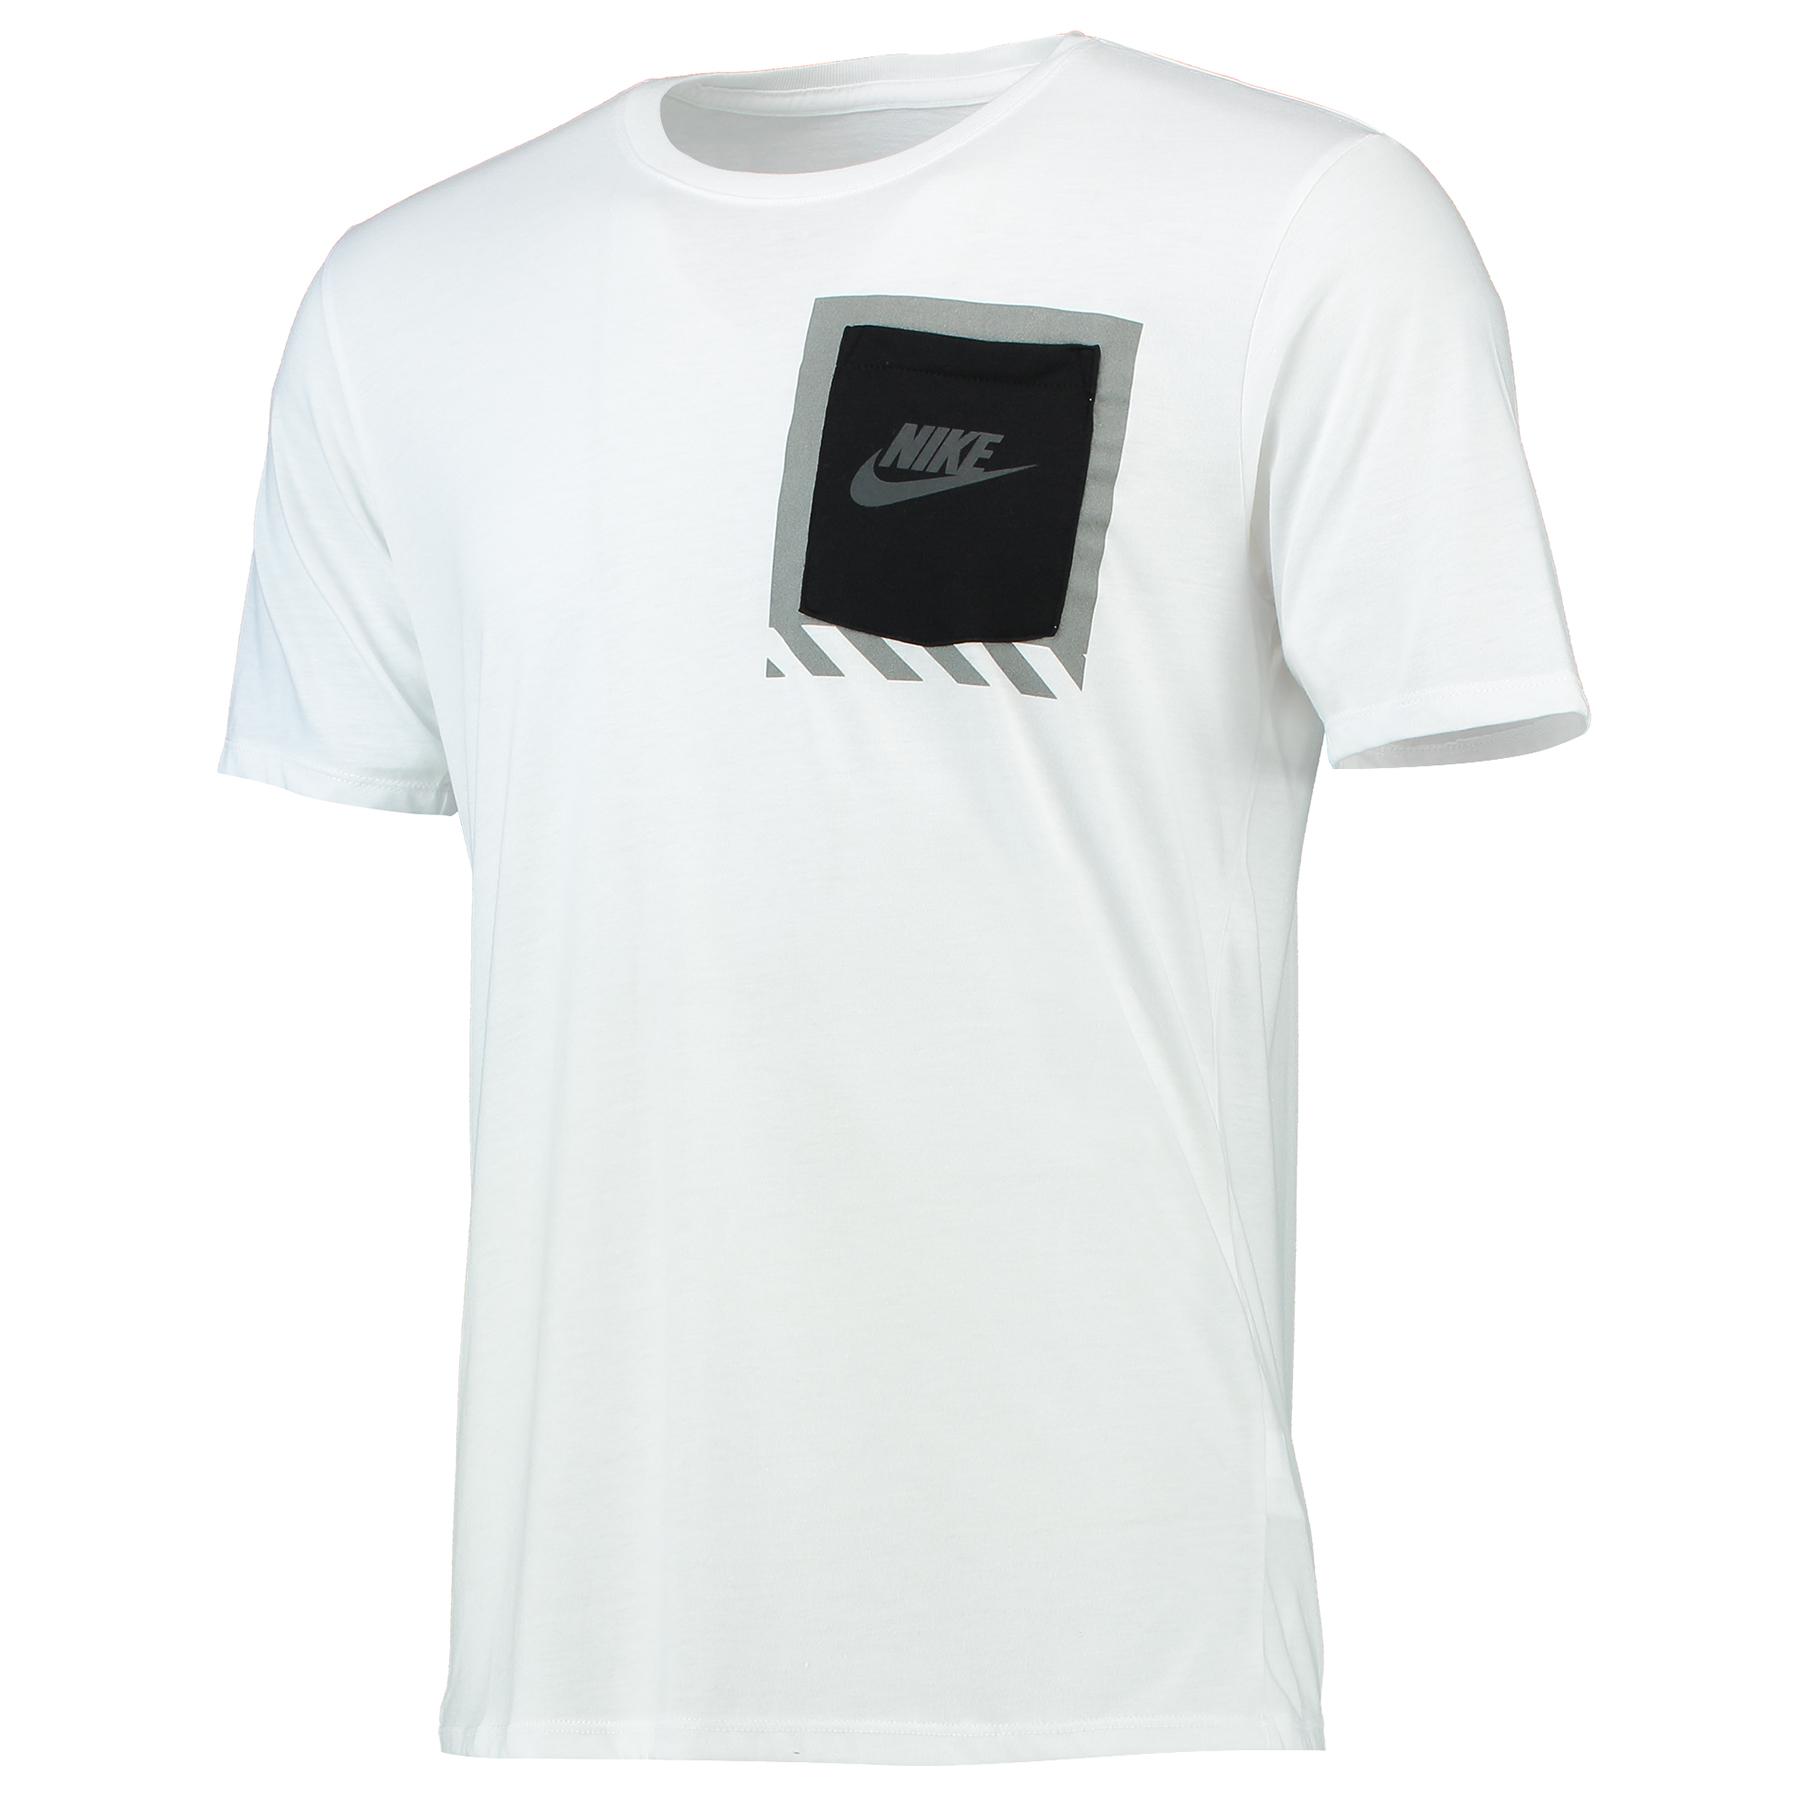 Image of Nike Bonded Box Pocket T-Shirt White, White